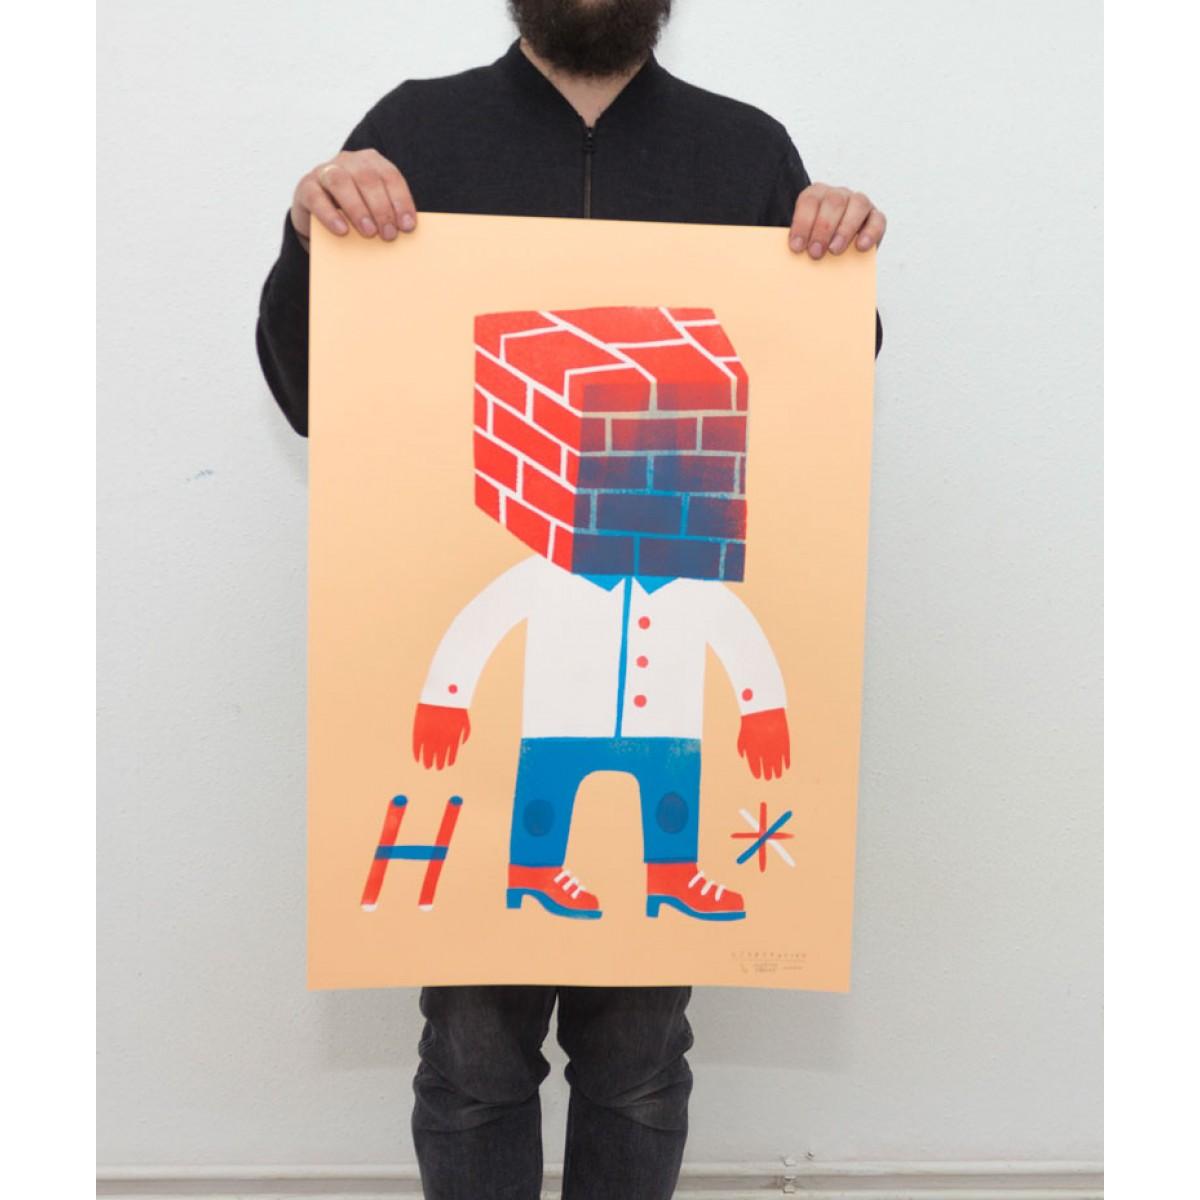 Martin Krusche – Stencil Artprint »Subjektiv« 50x70cm